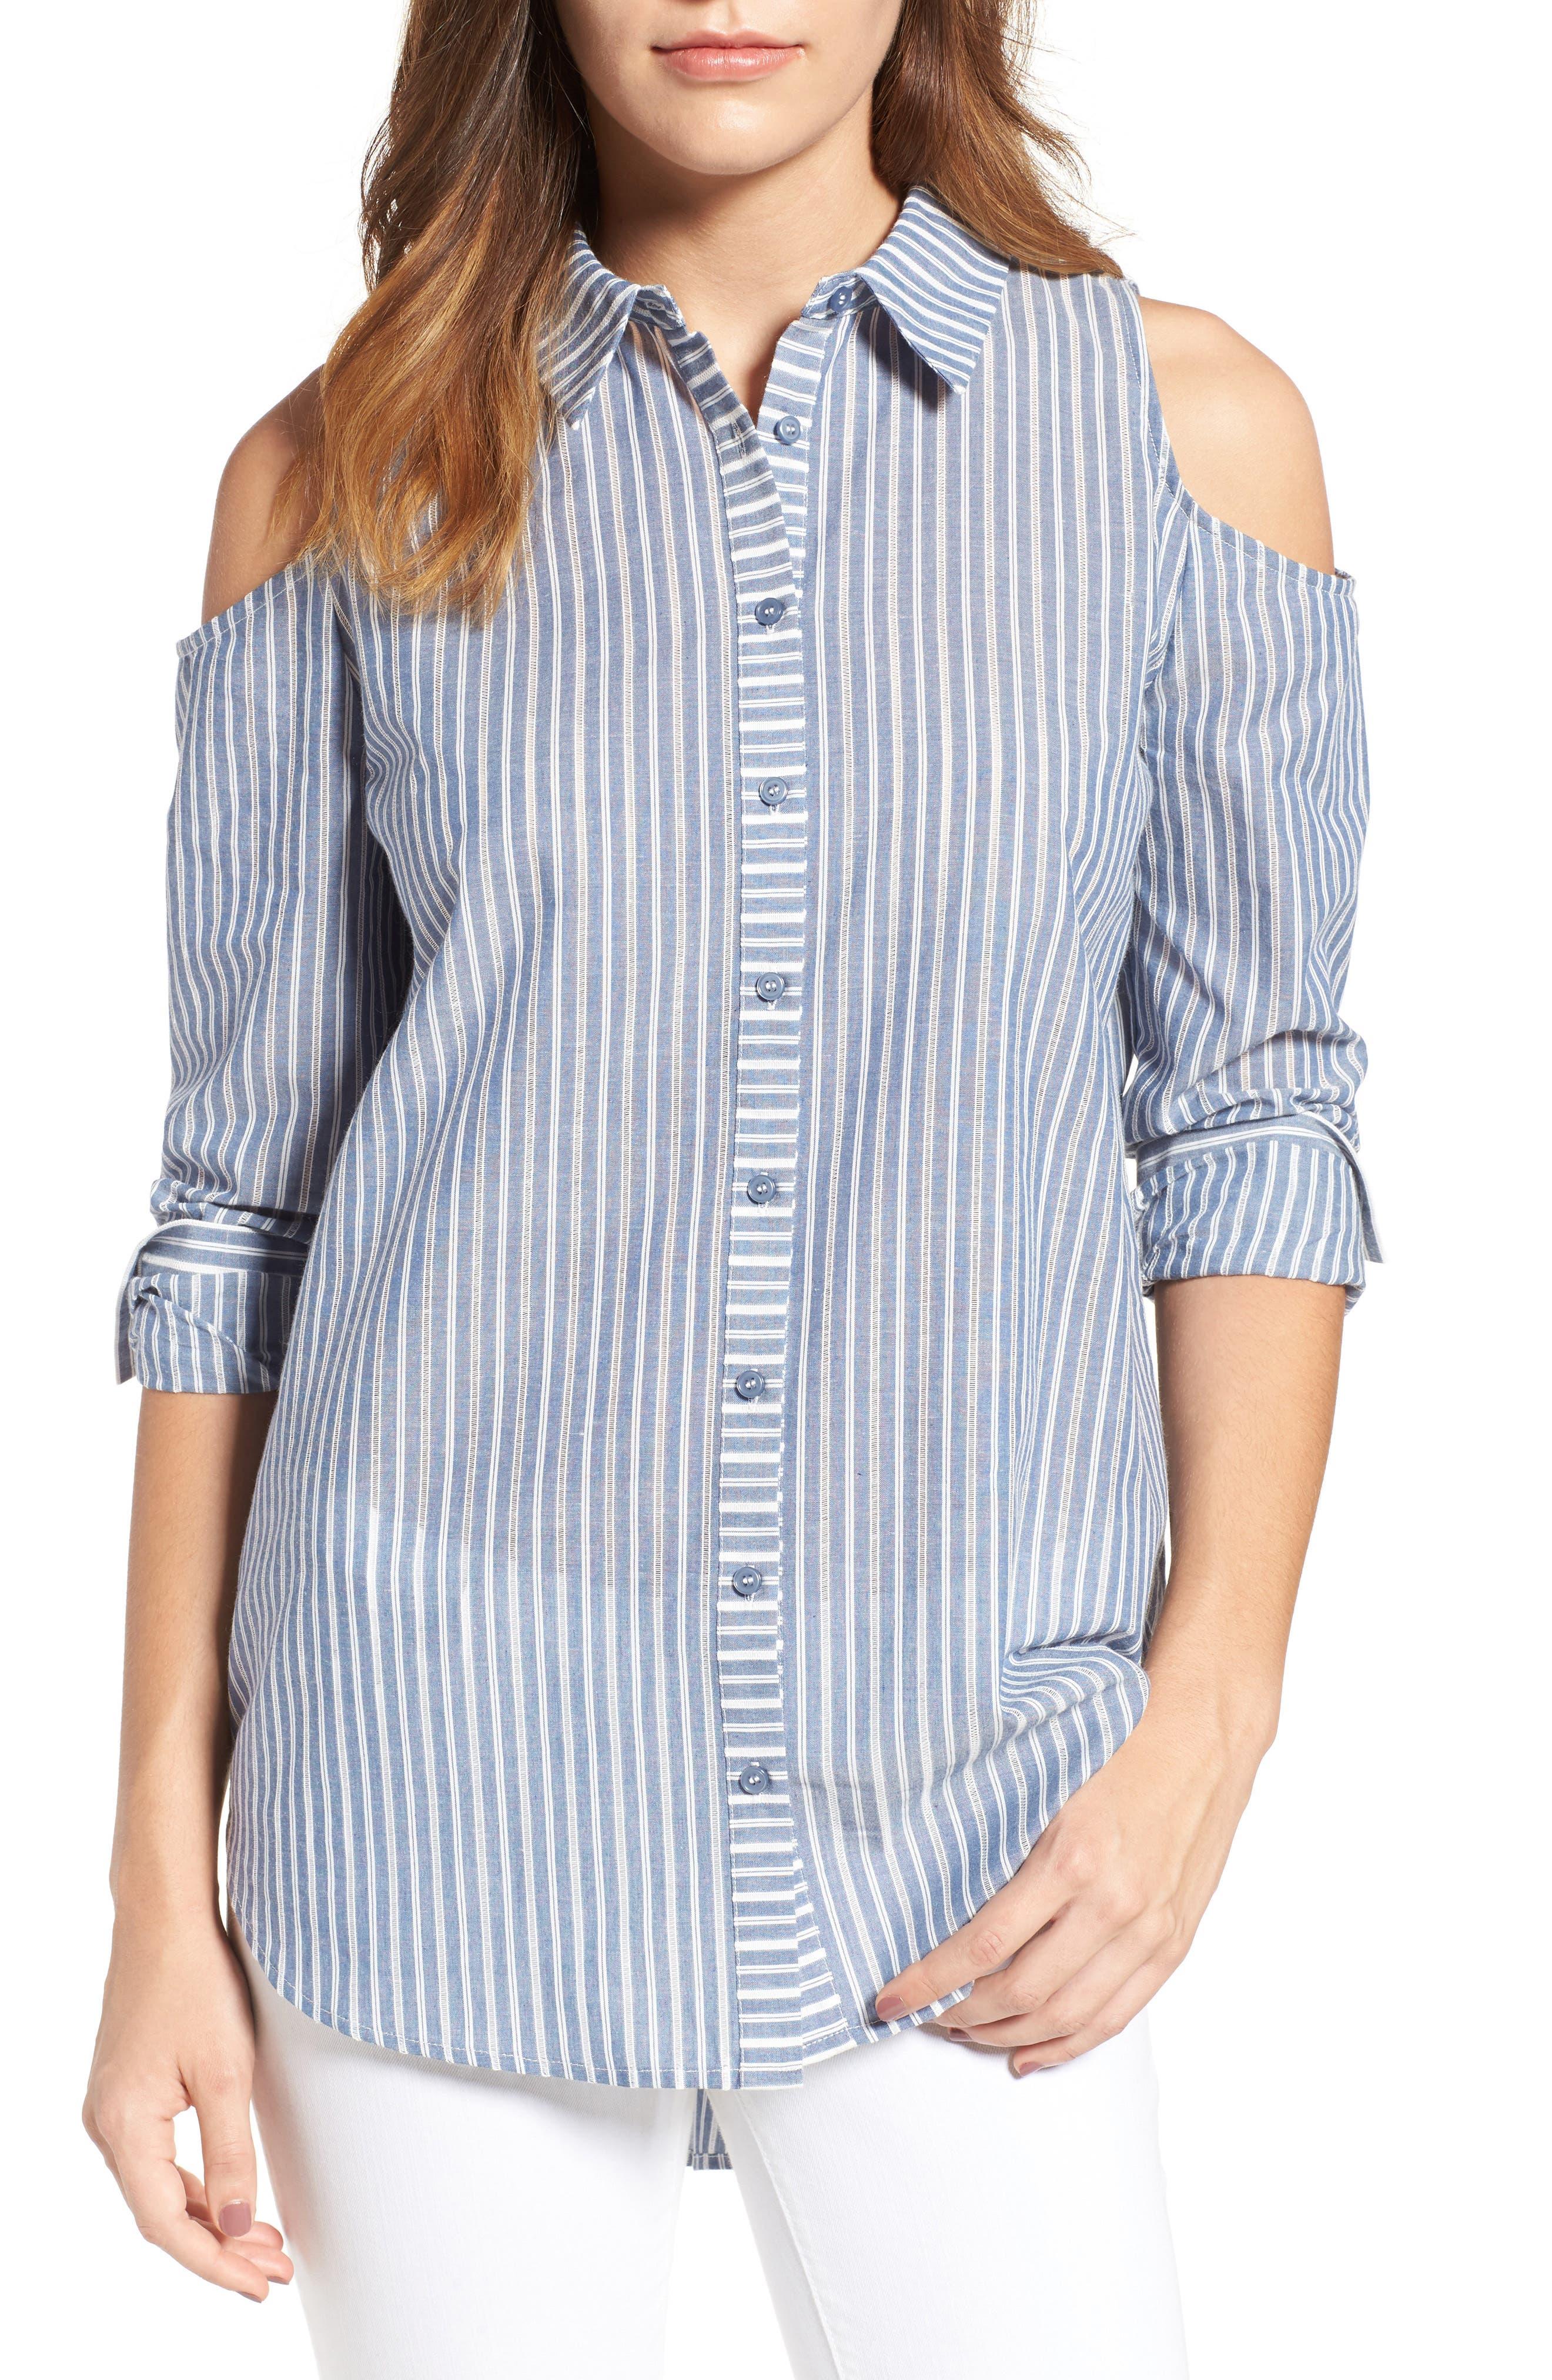 Alternate Image 1 Selected - Pleione Cold Shoulder Stripe Jacquard Shirt (Regular & Petite)